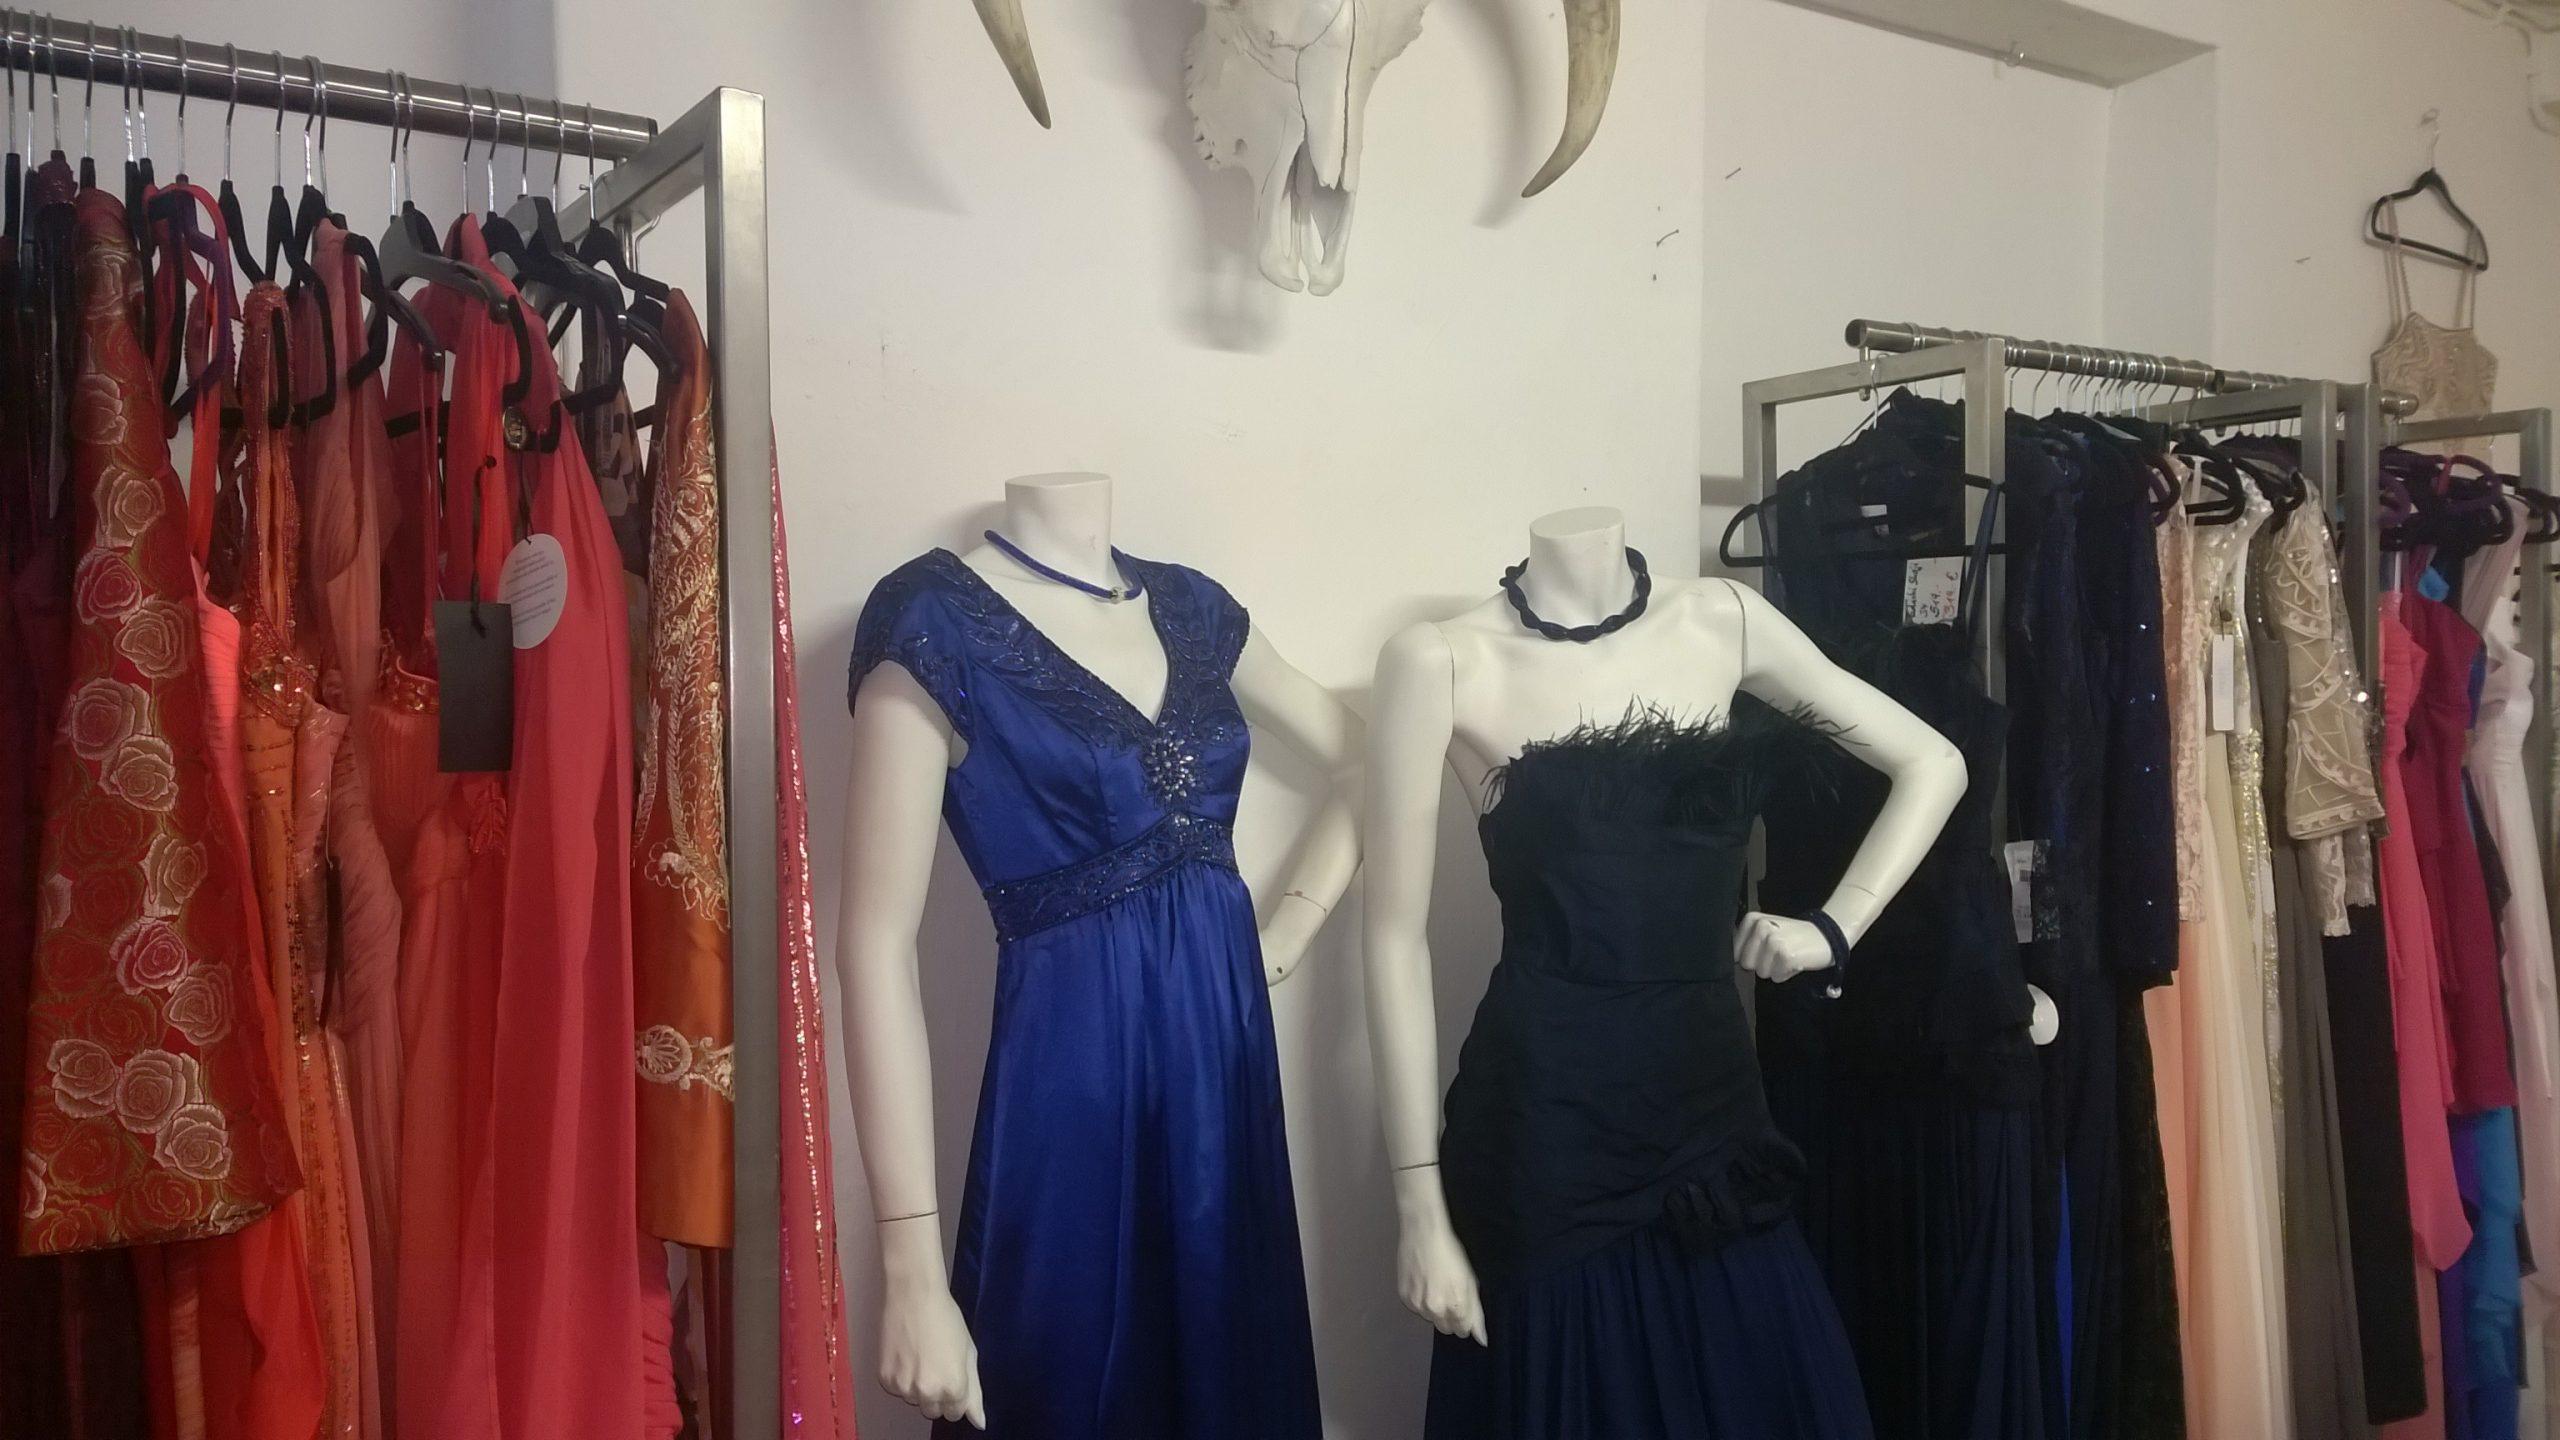 Cool Outlet Abend Kleider VertriebAbend Elegant Outlet Abend Kleider Spezialgebiet